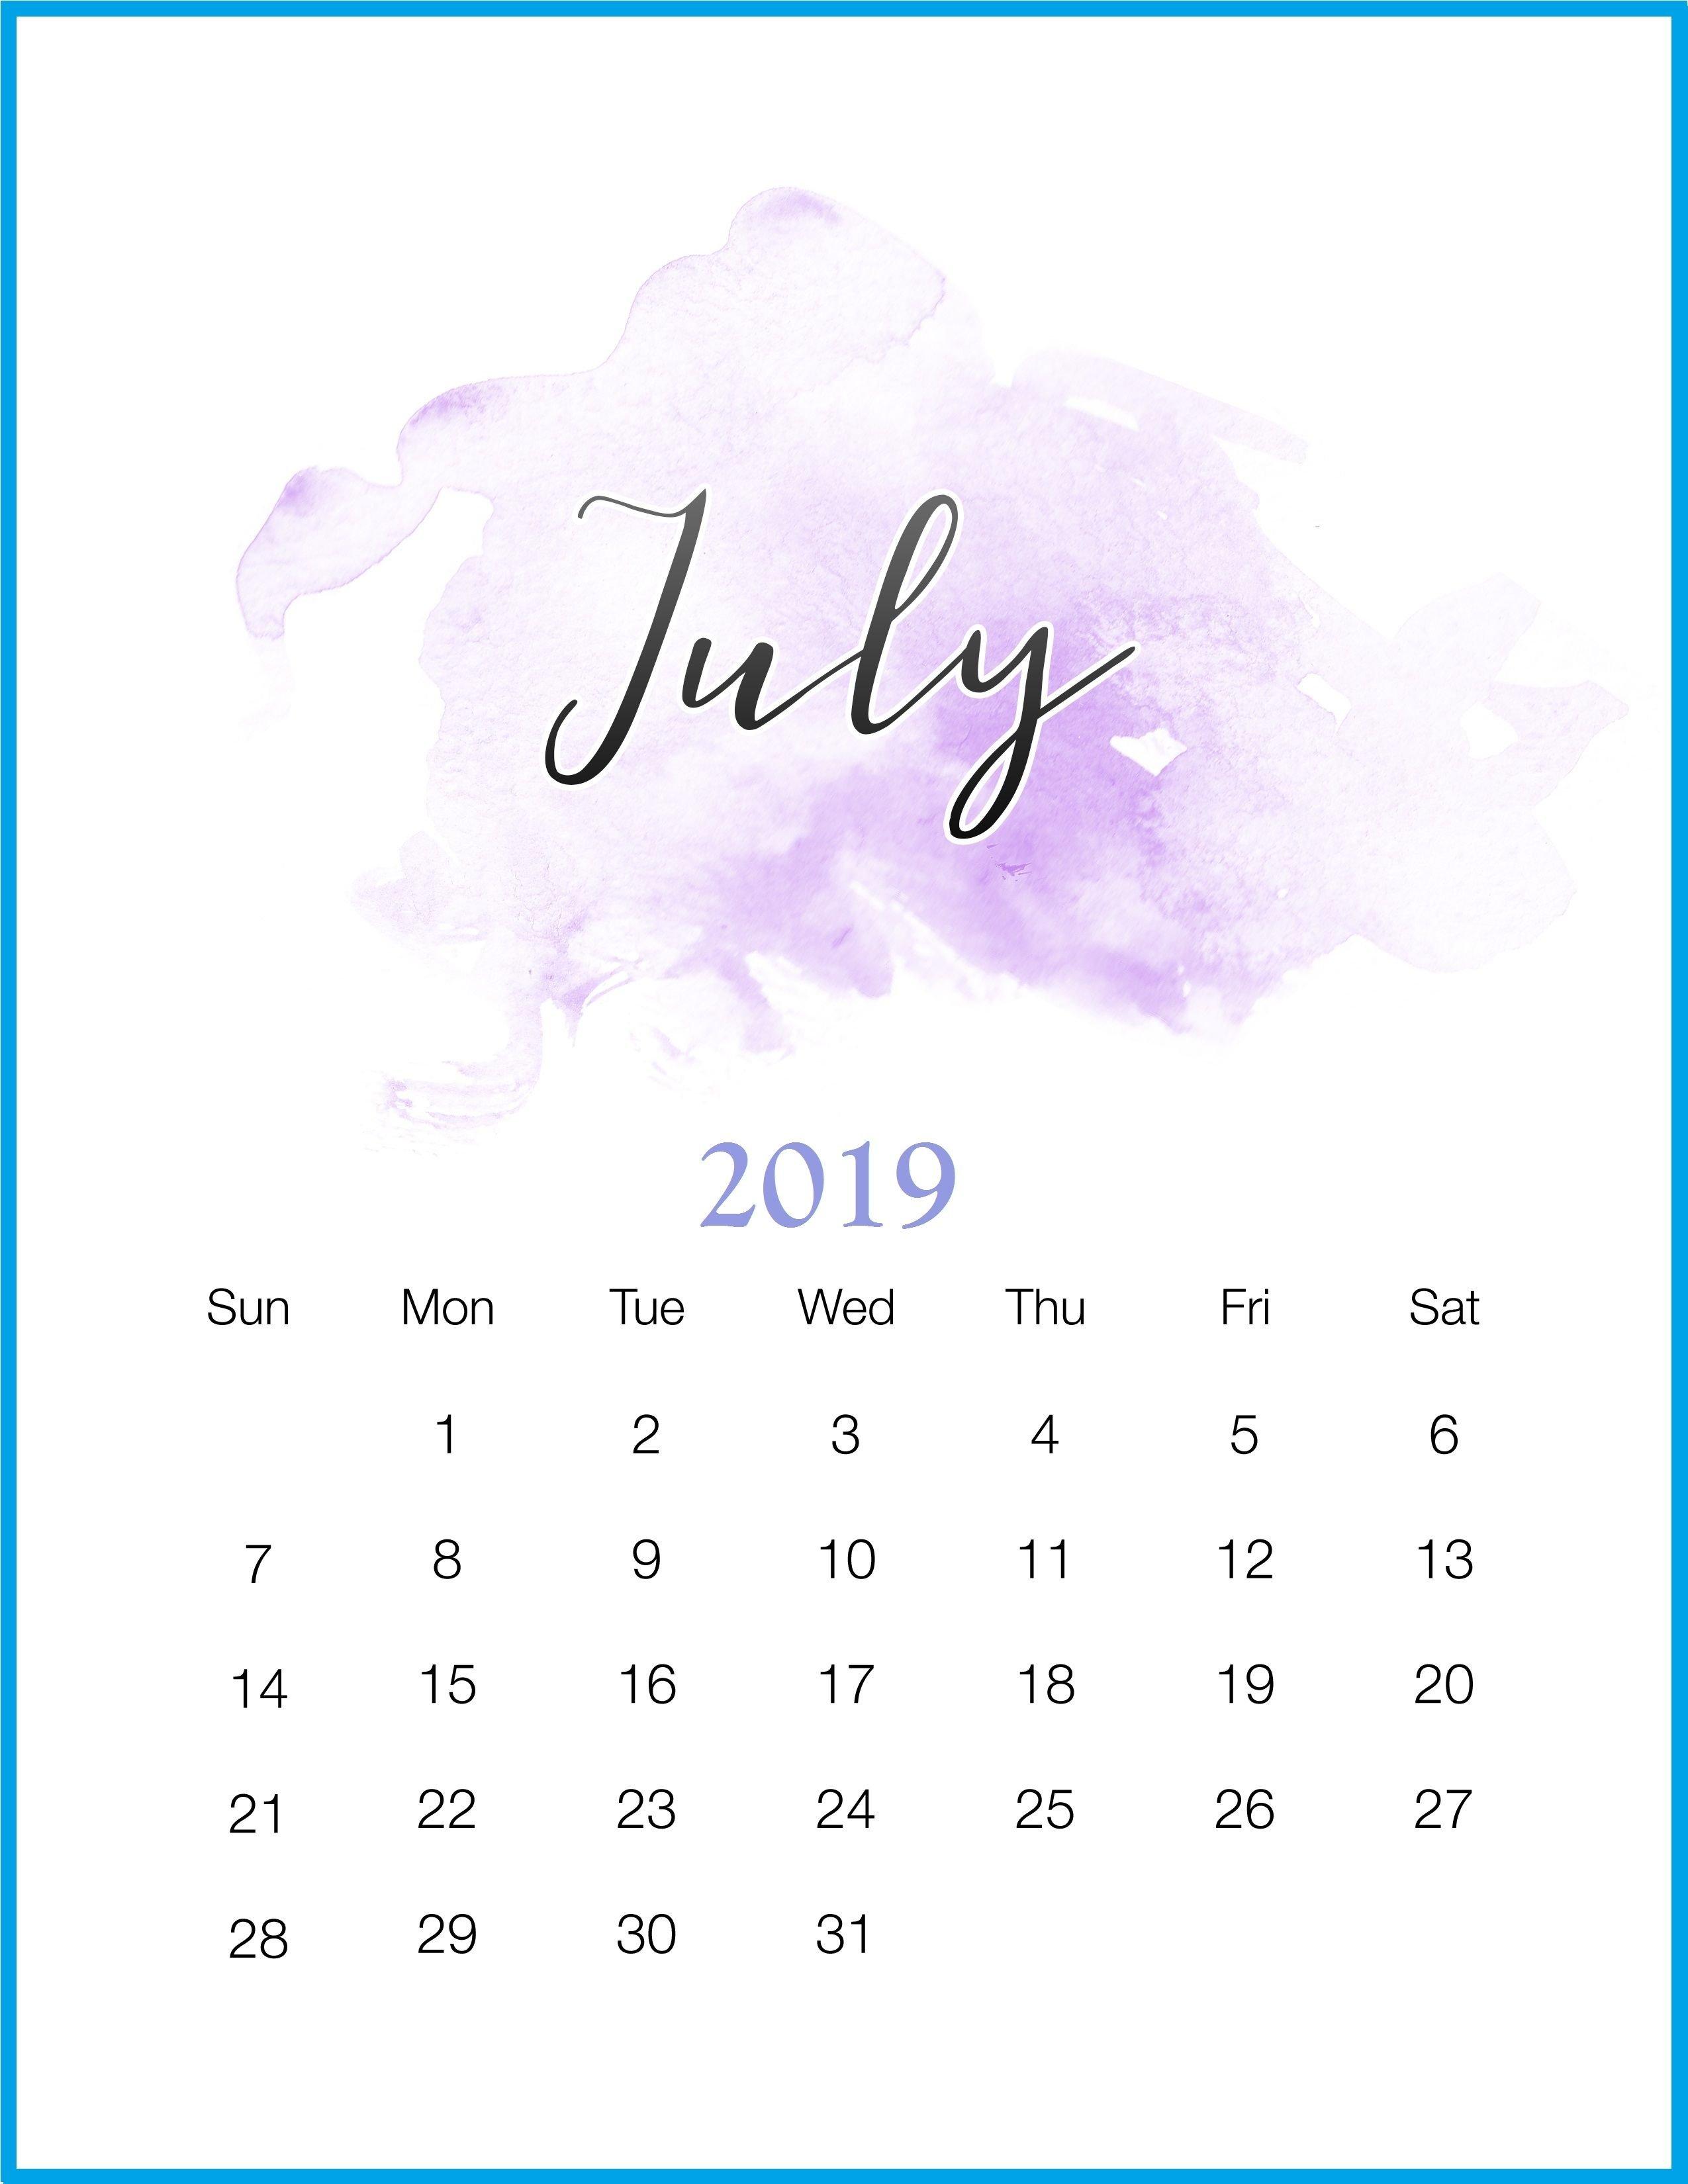 Get Free July 2019 Calendar Template Decemberjuly 2019 Calendar Calendar July 4 2019